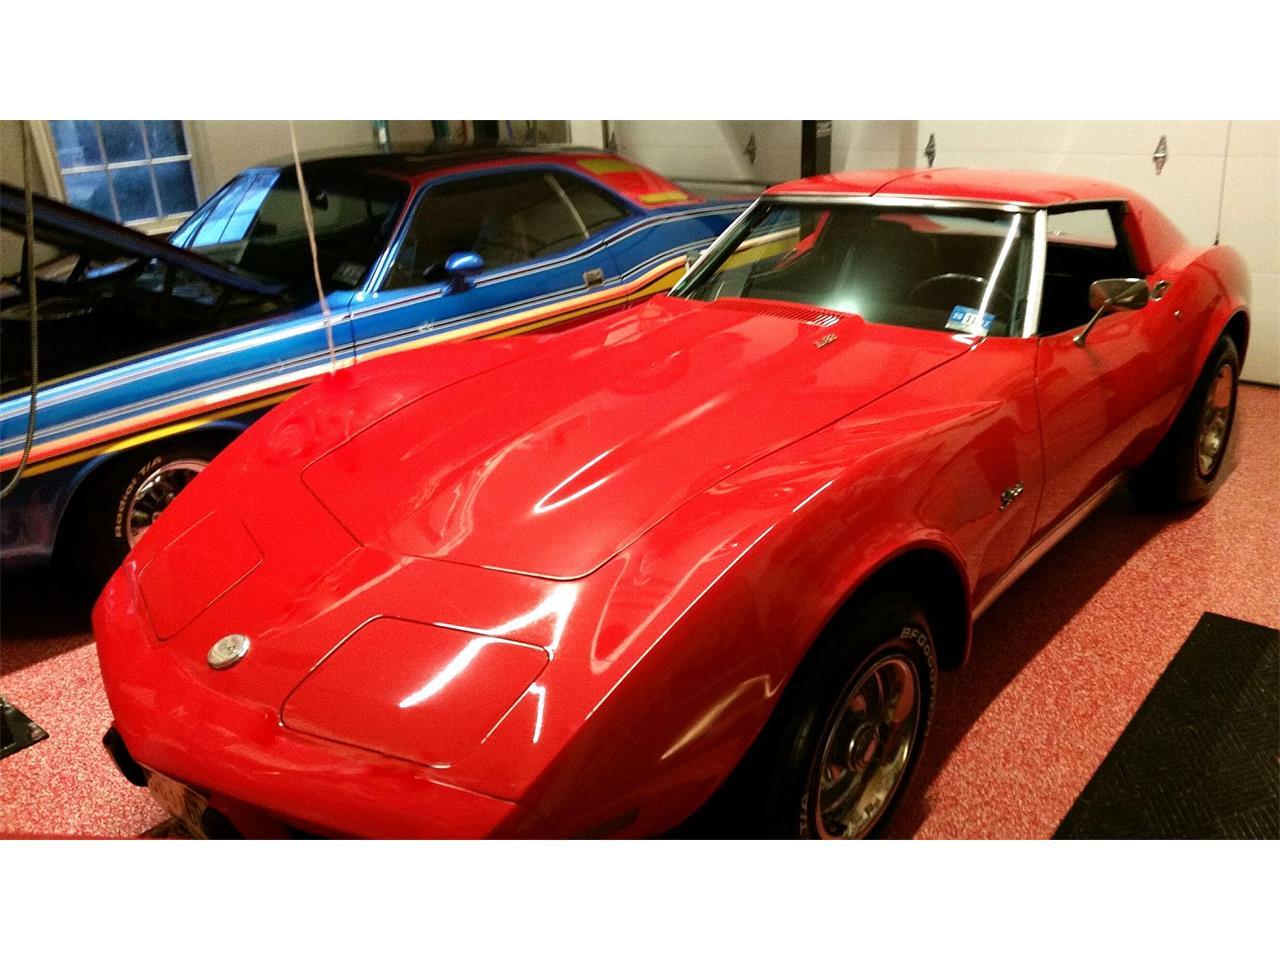 1975 Chevrolet Corvette (CC-1375196) for sale in Stratford, New Jersey